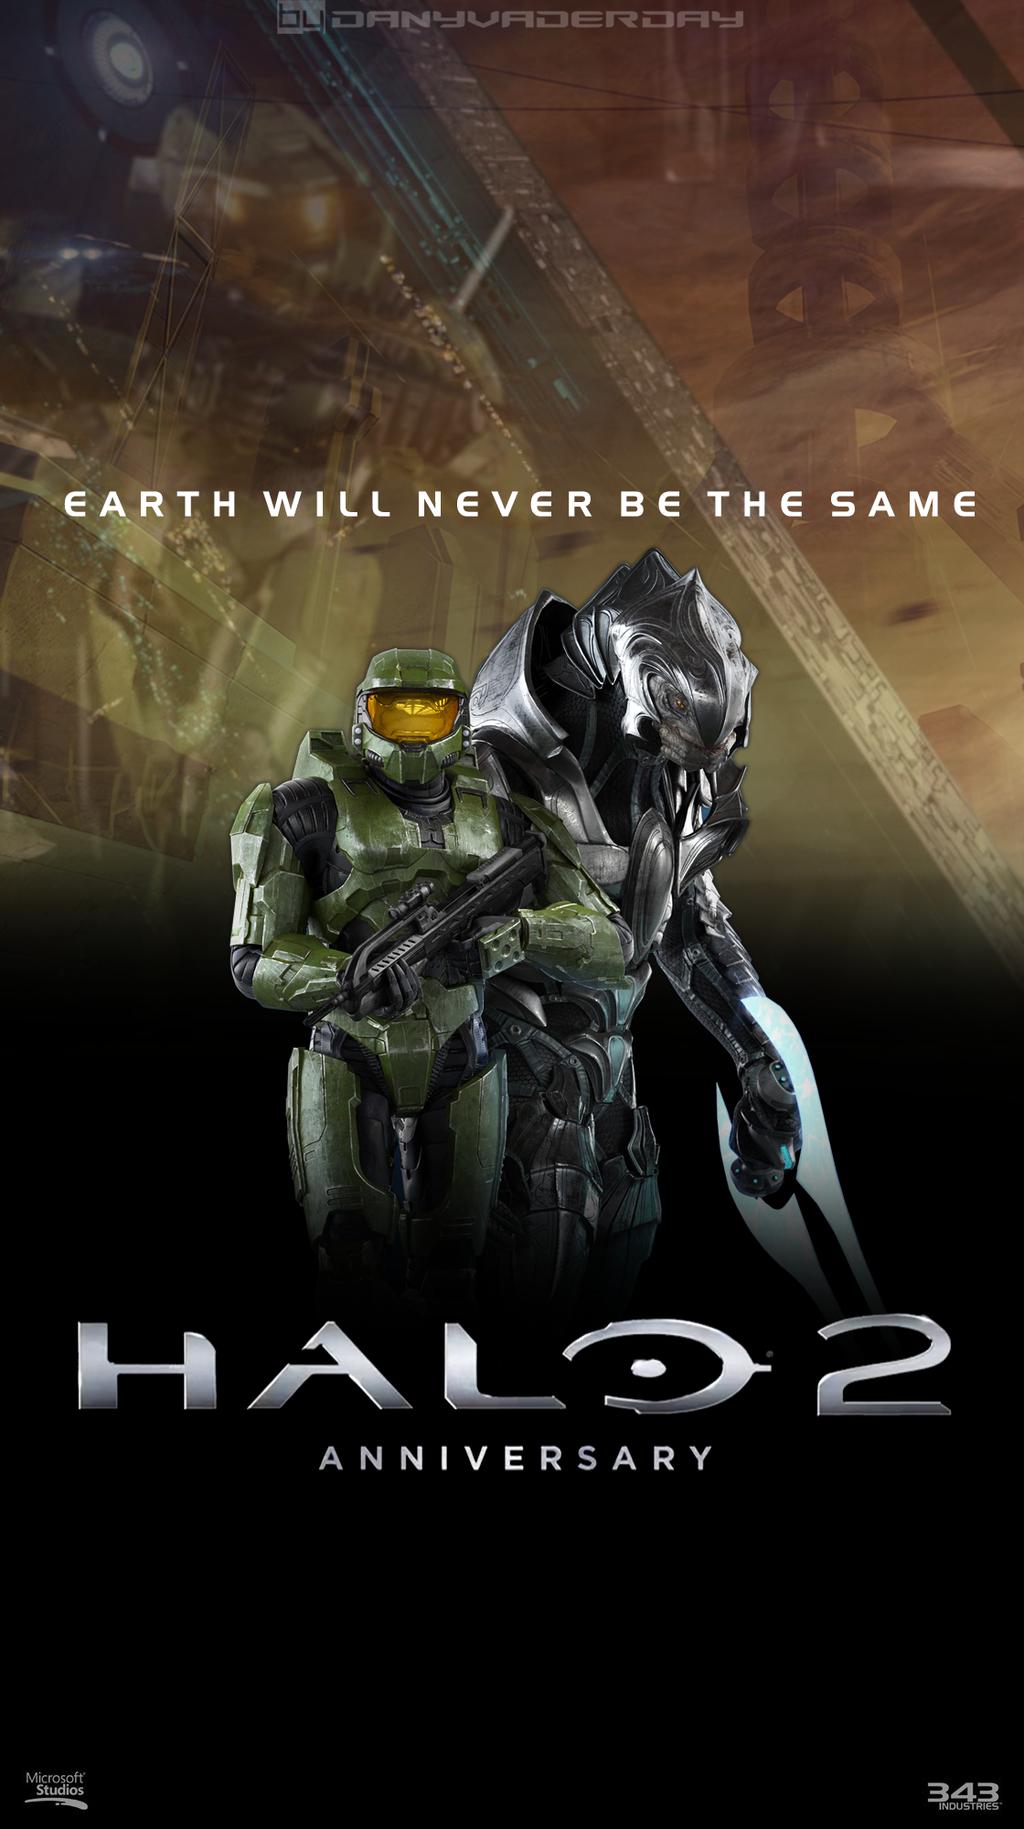 Halo 2 (NT)